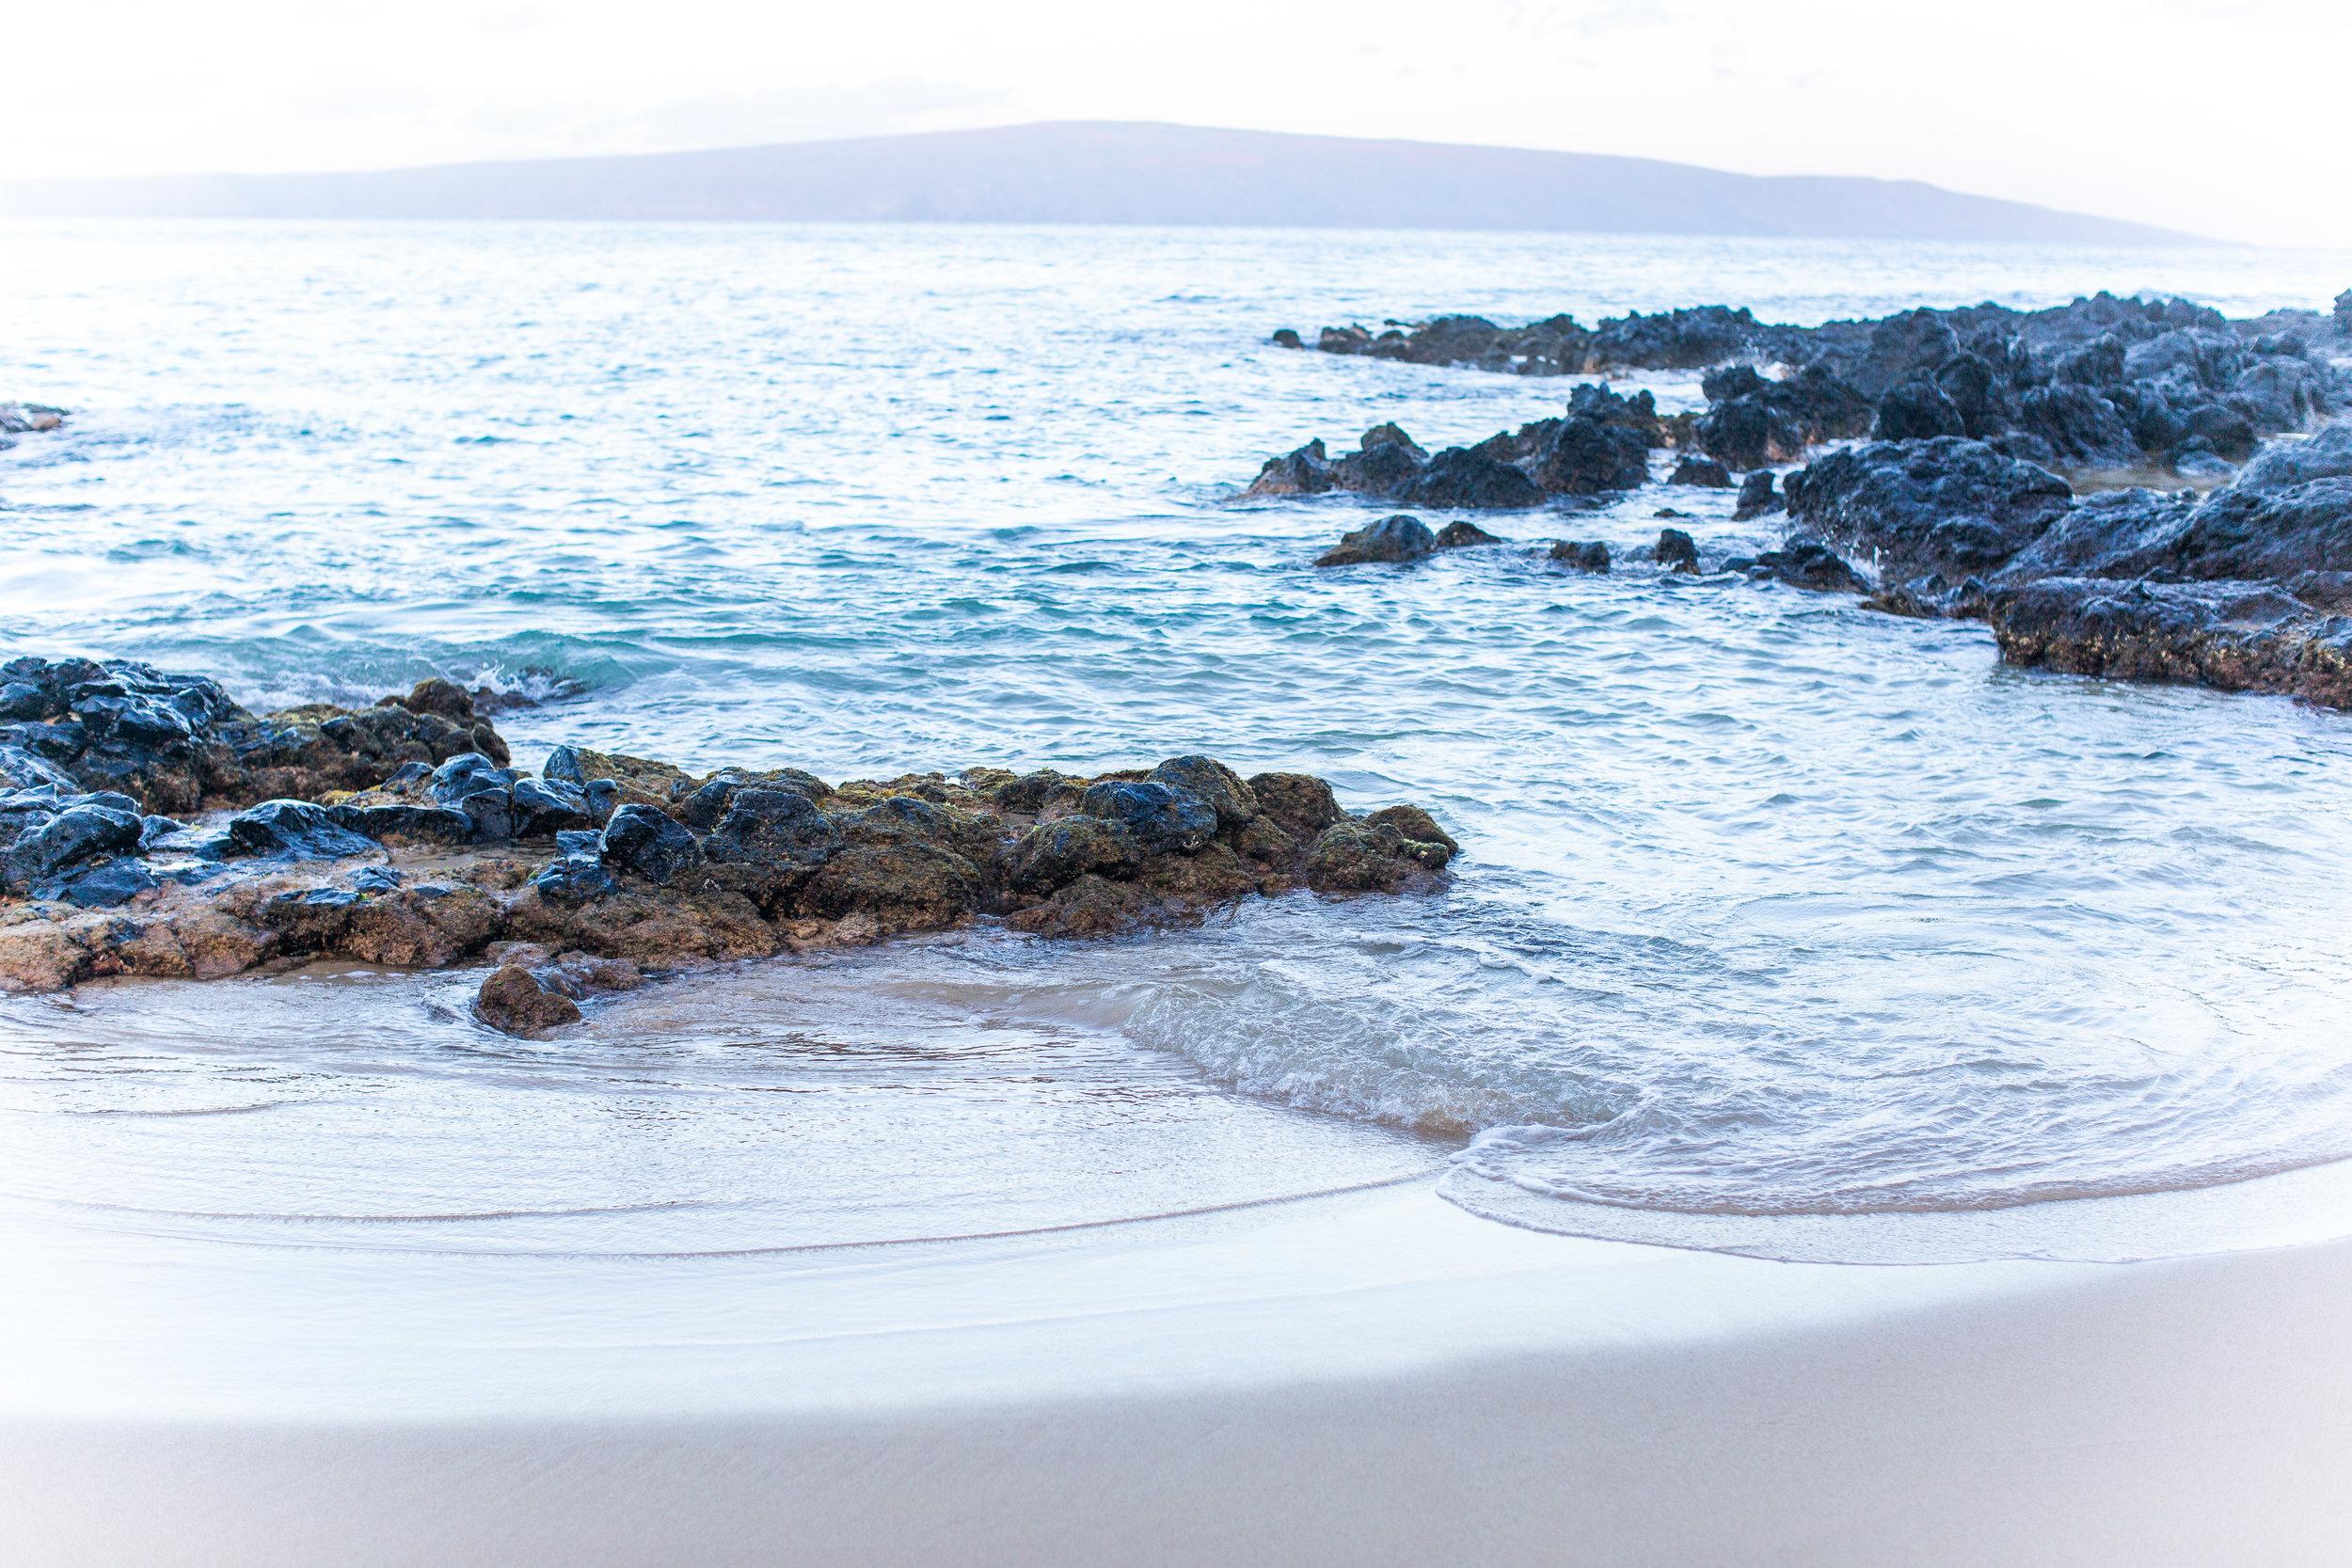 fizz-fade-hawaii-sunrise-stripes2-77.jpg